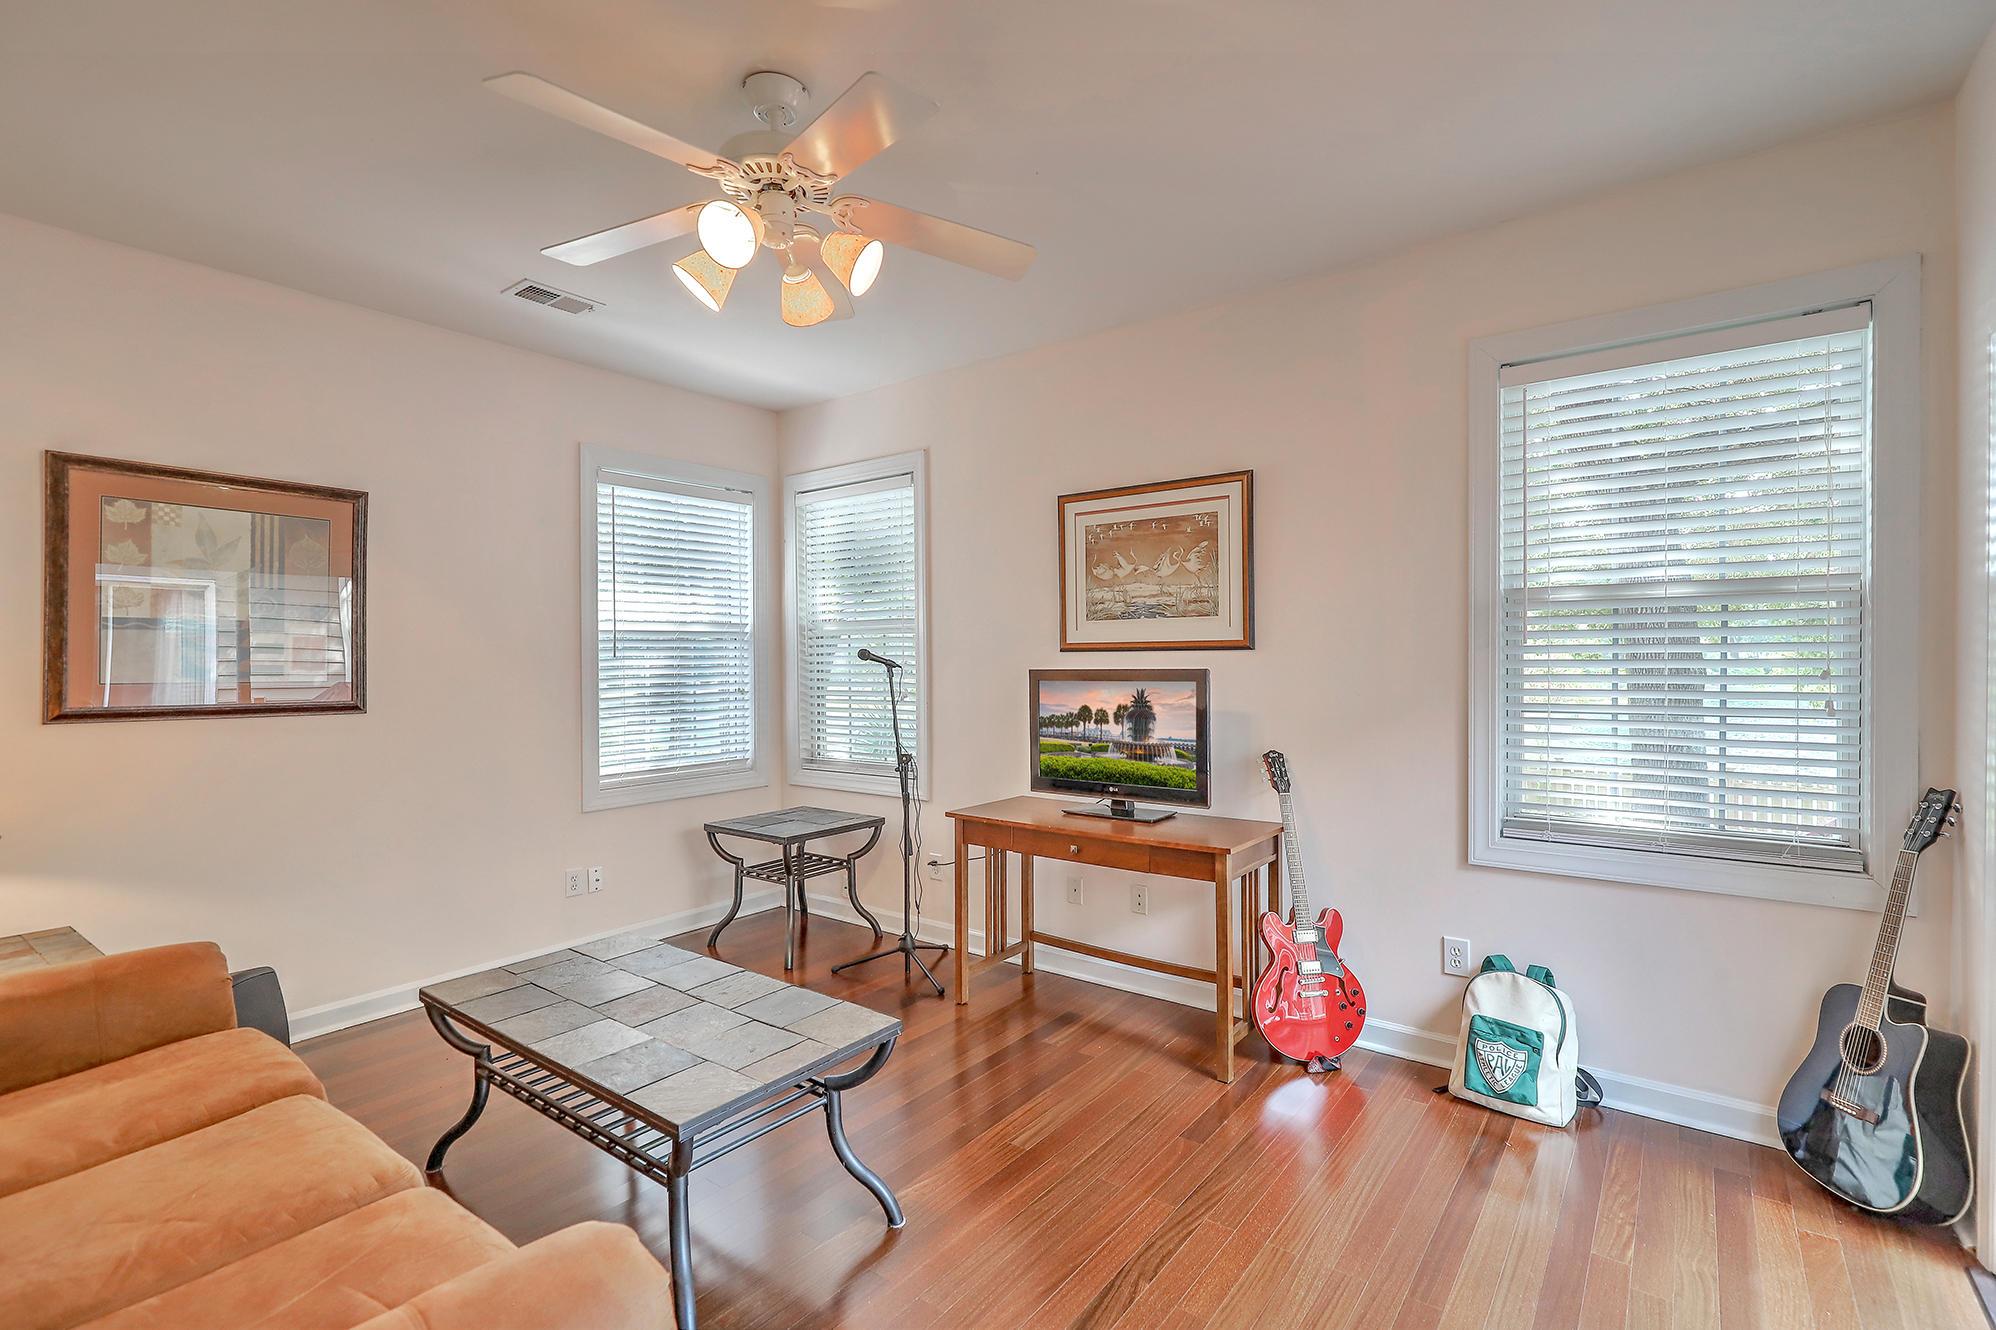 Seaside Farms Homes For Sale - 1244 Palmetto Peninsula, Mount Pleasant, SC - 26